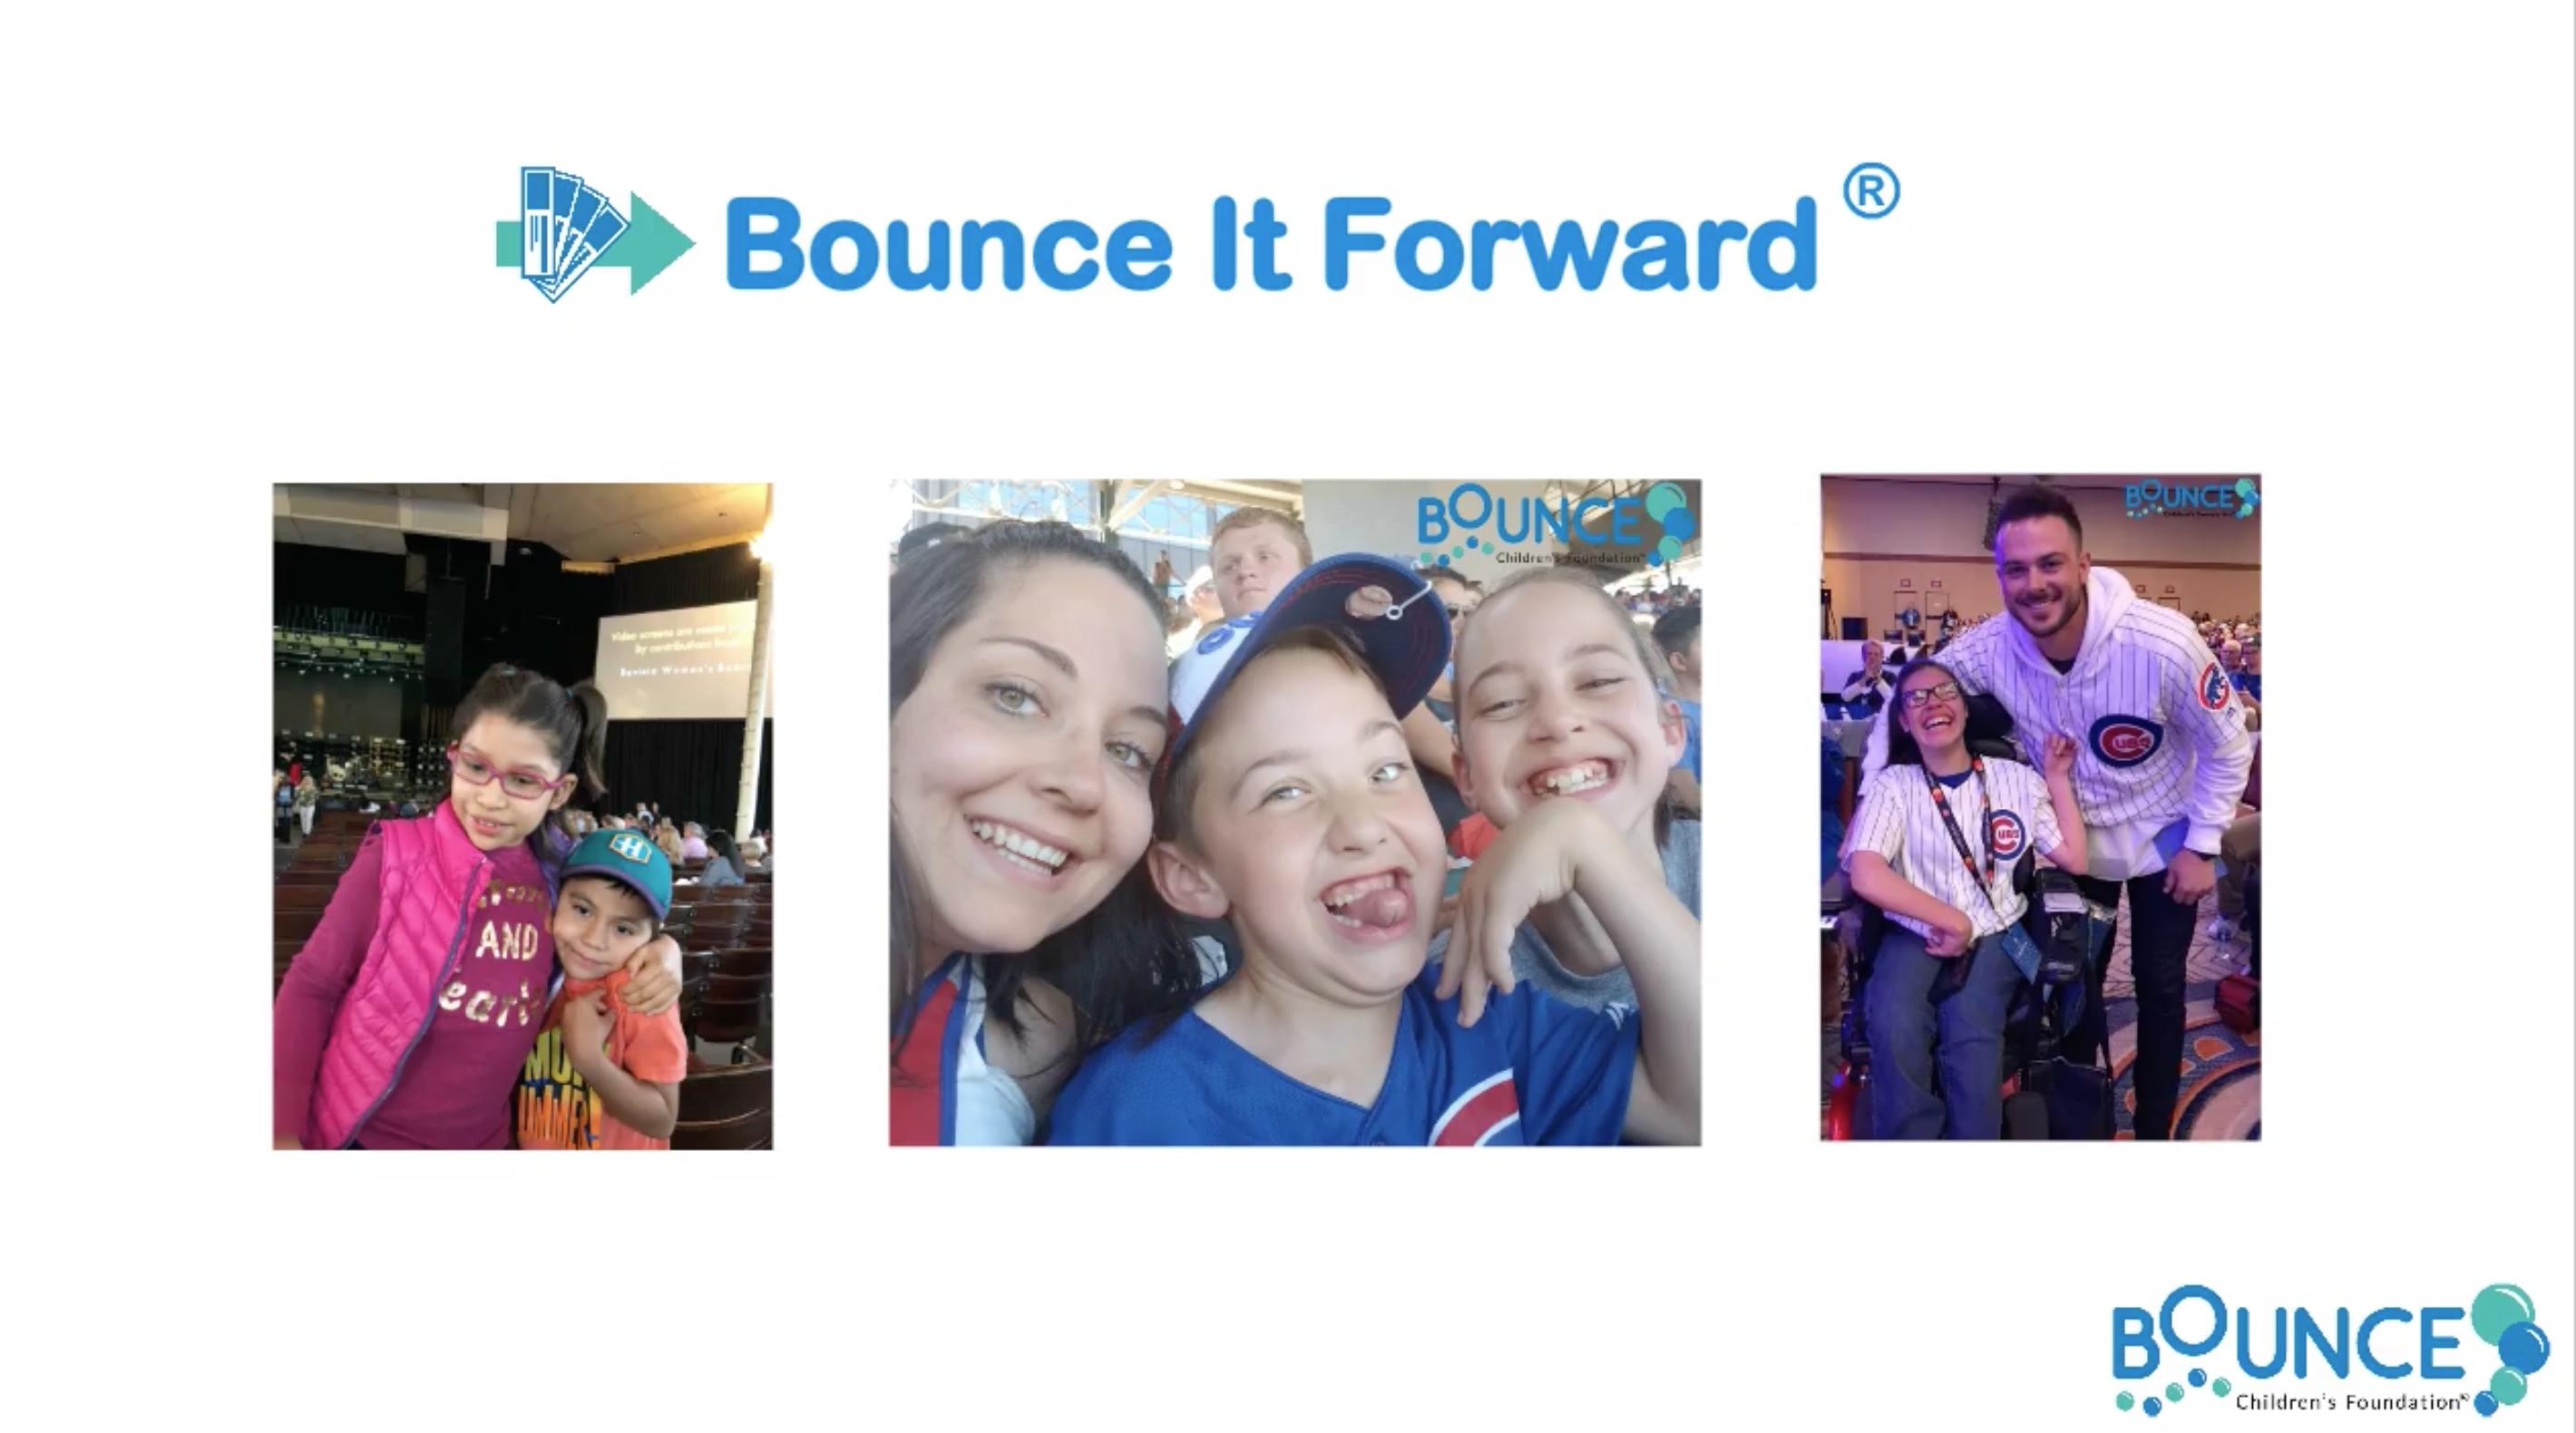 Bounce It Forward